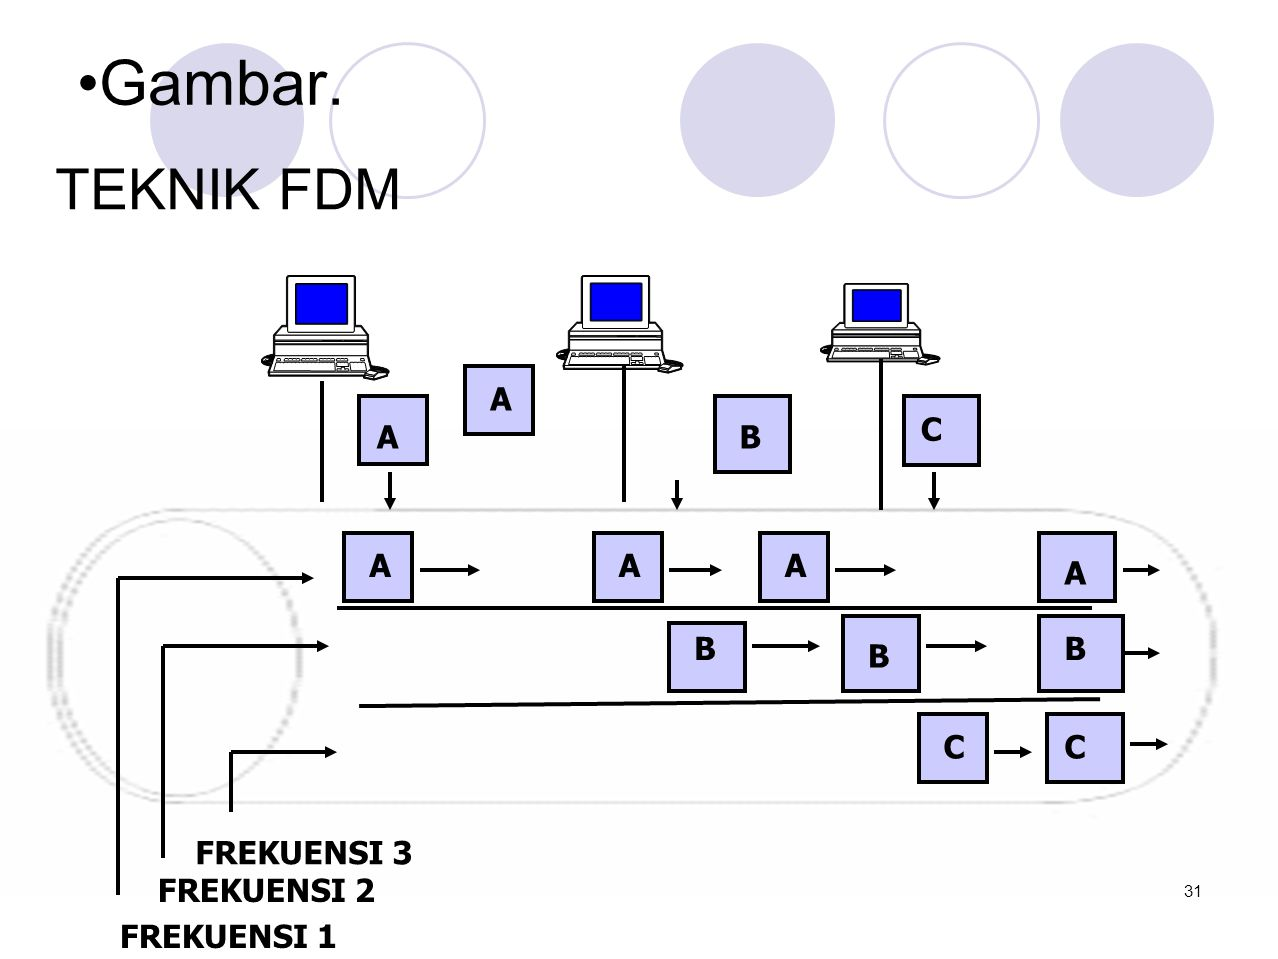 •Gambar. TEKNIK FDM AB C AAA A A B B B CC FREKUENSI 3 FREKUENSI 2 FREKUENSI 1 31